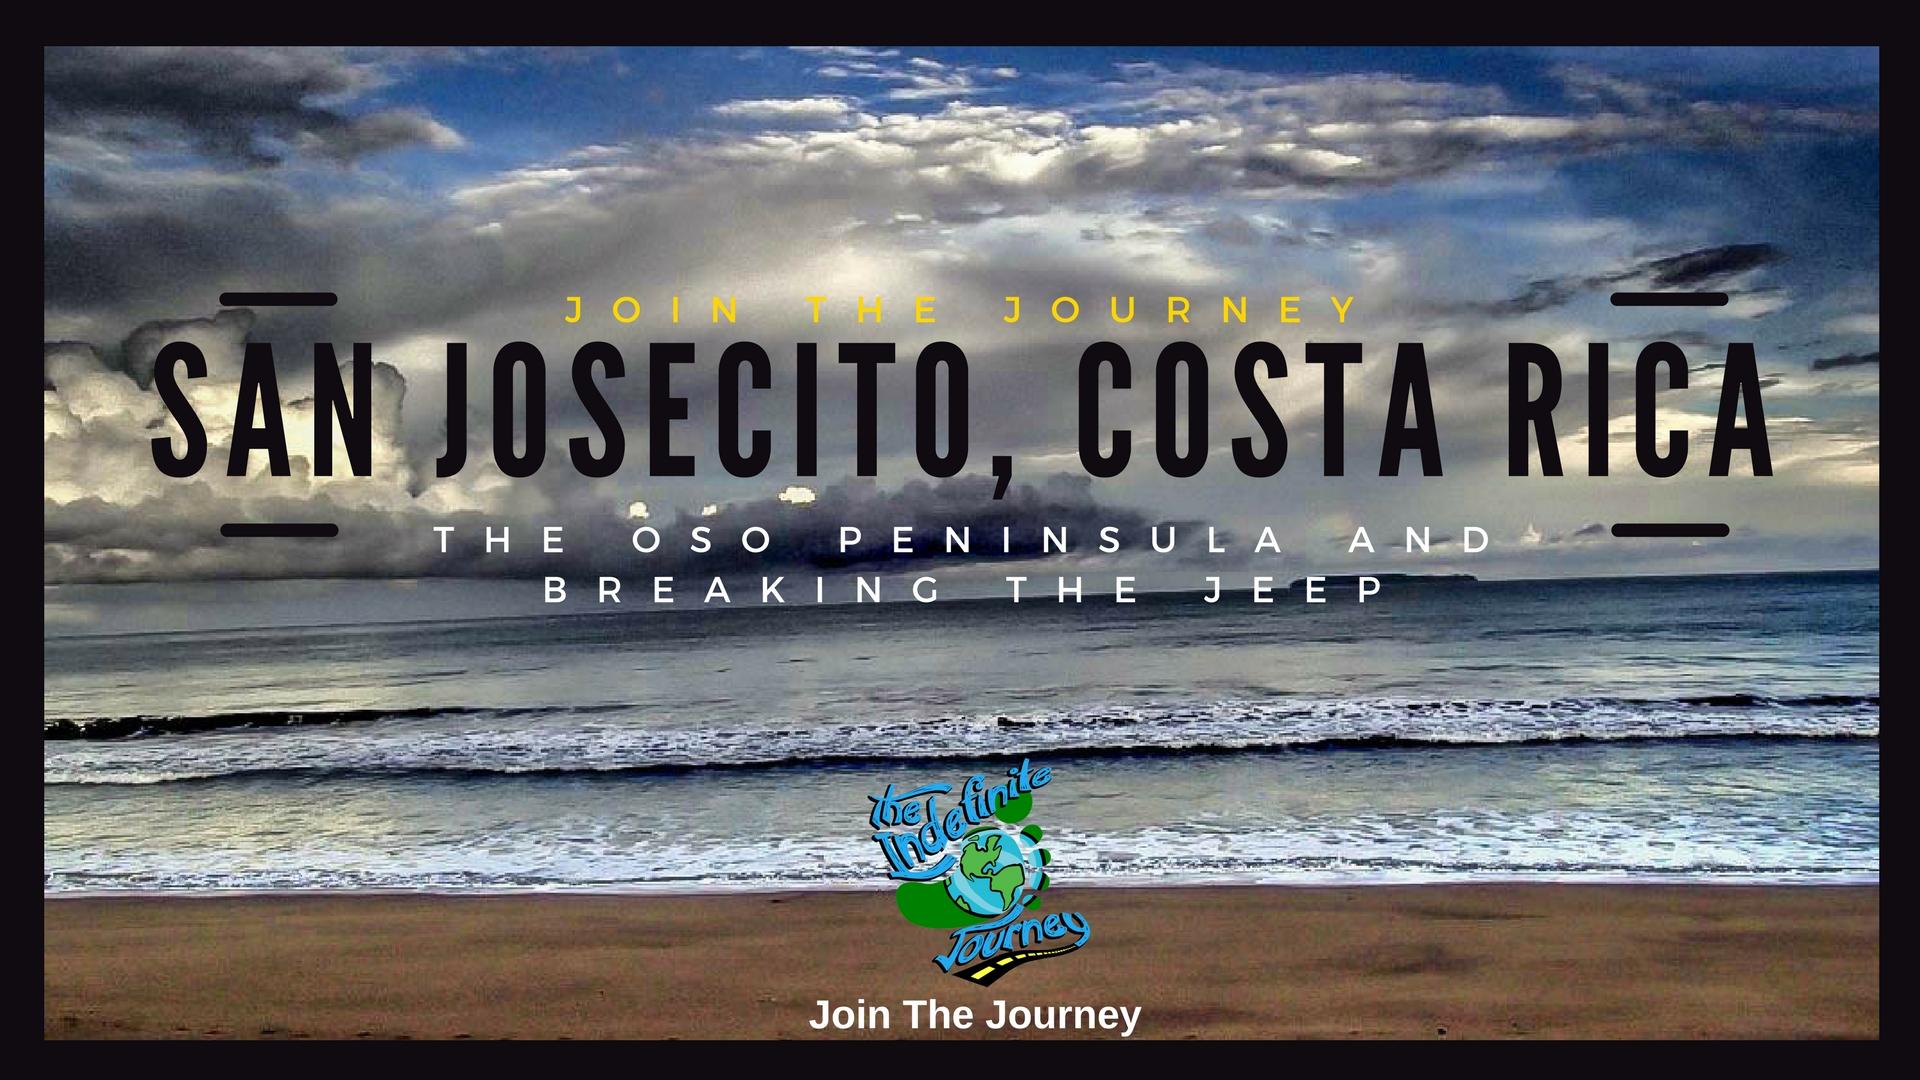 San Josecito, Costa Rica In The Oso Peninsula And Breaking The Jeep